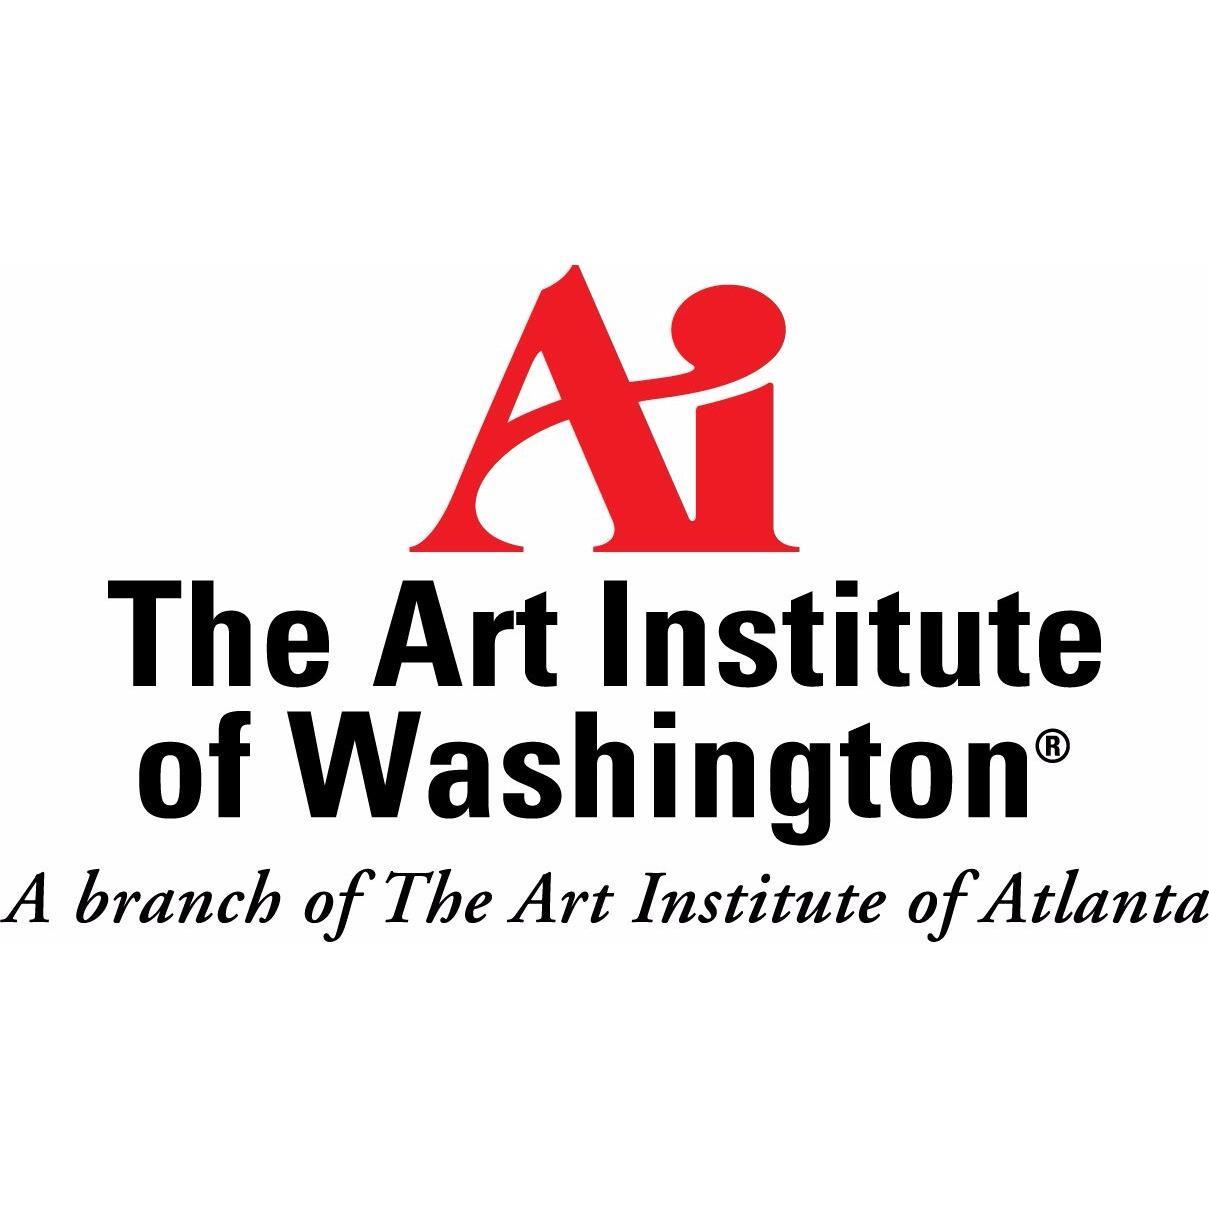 Art Institute Of Washington Coupons Near Me In Arlington